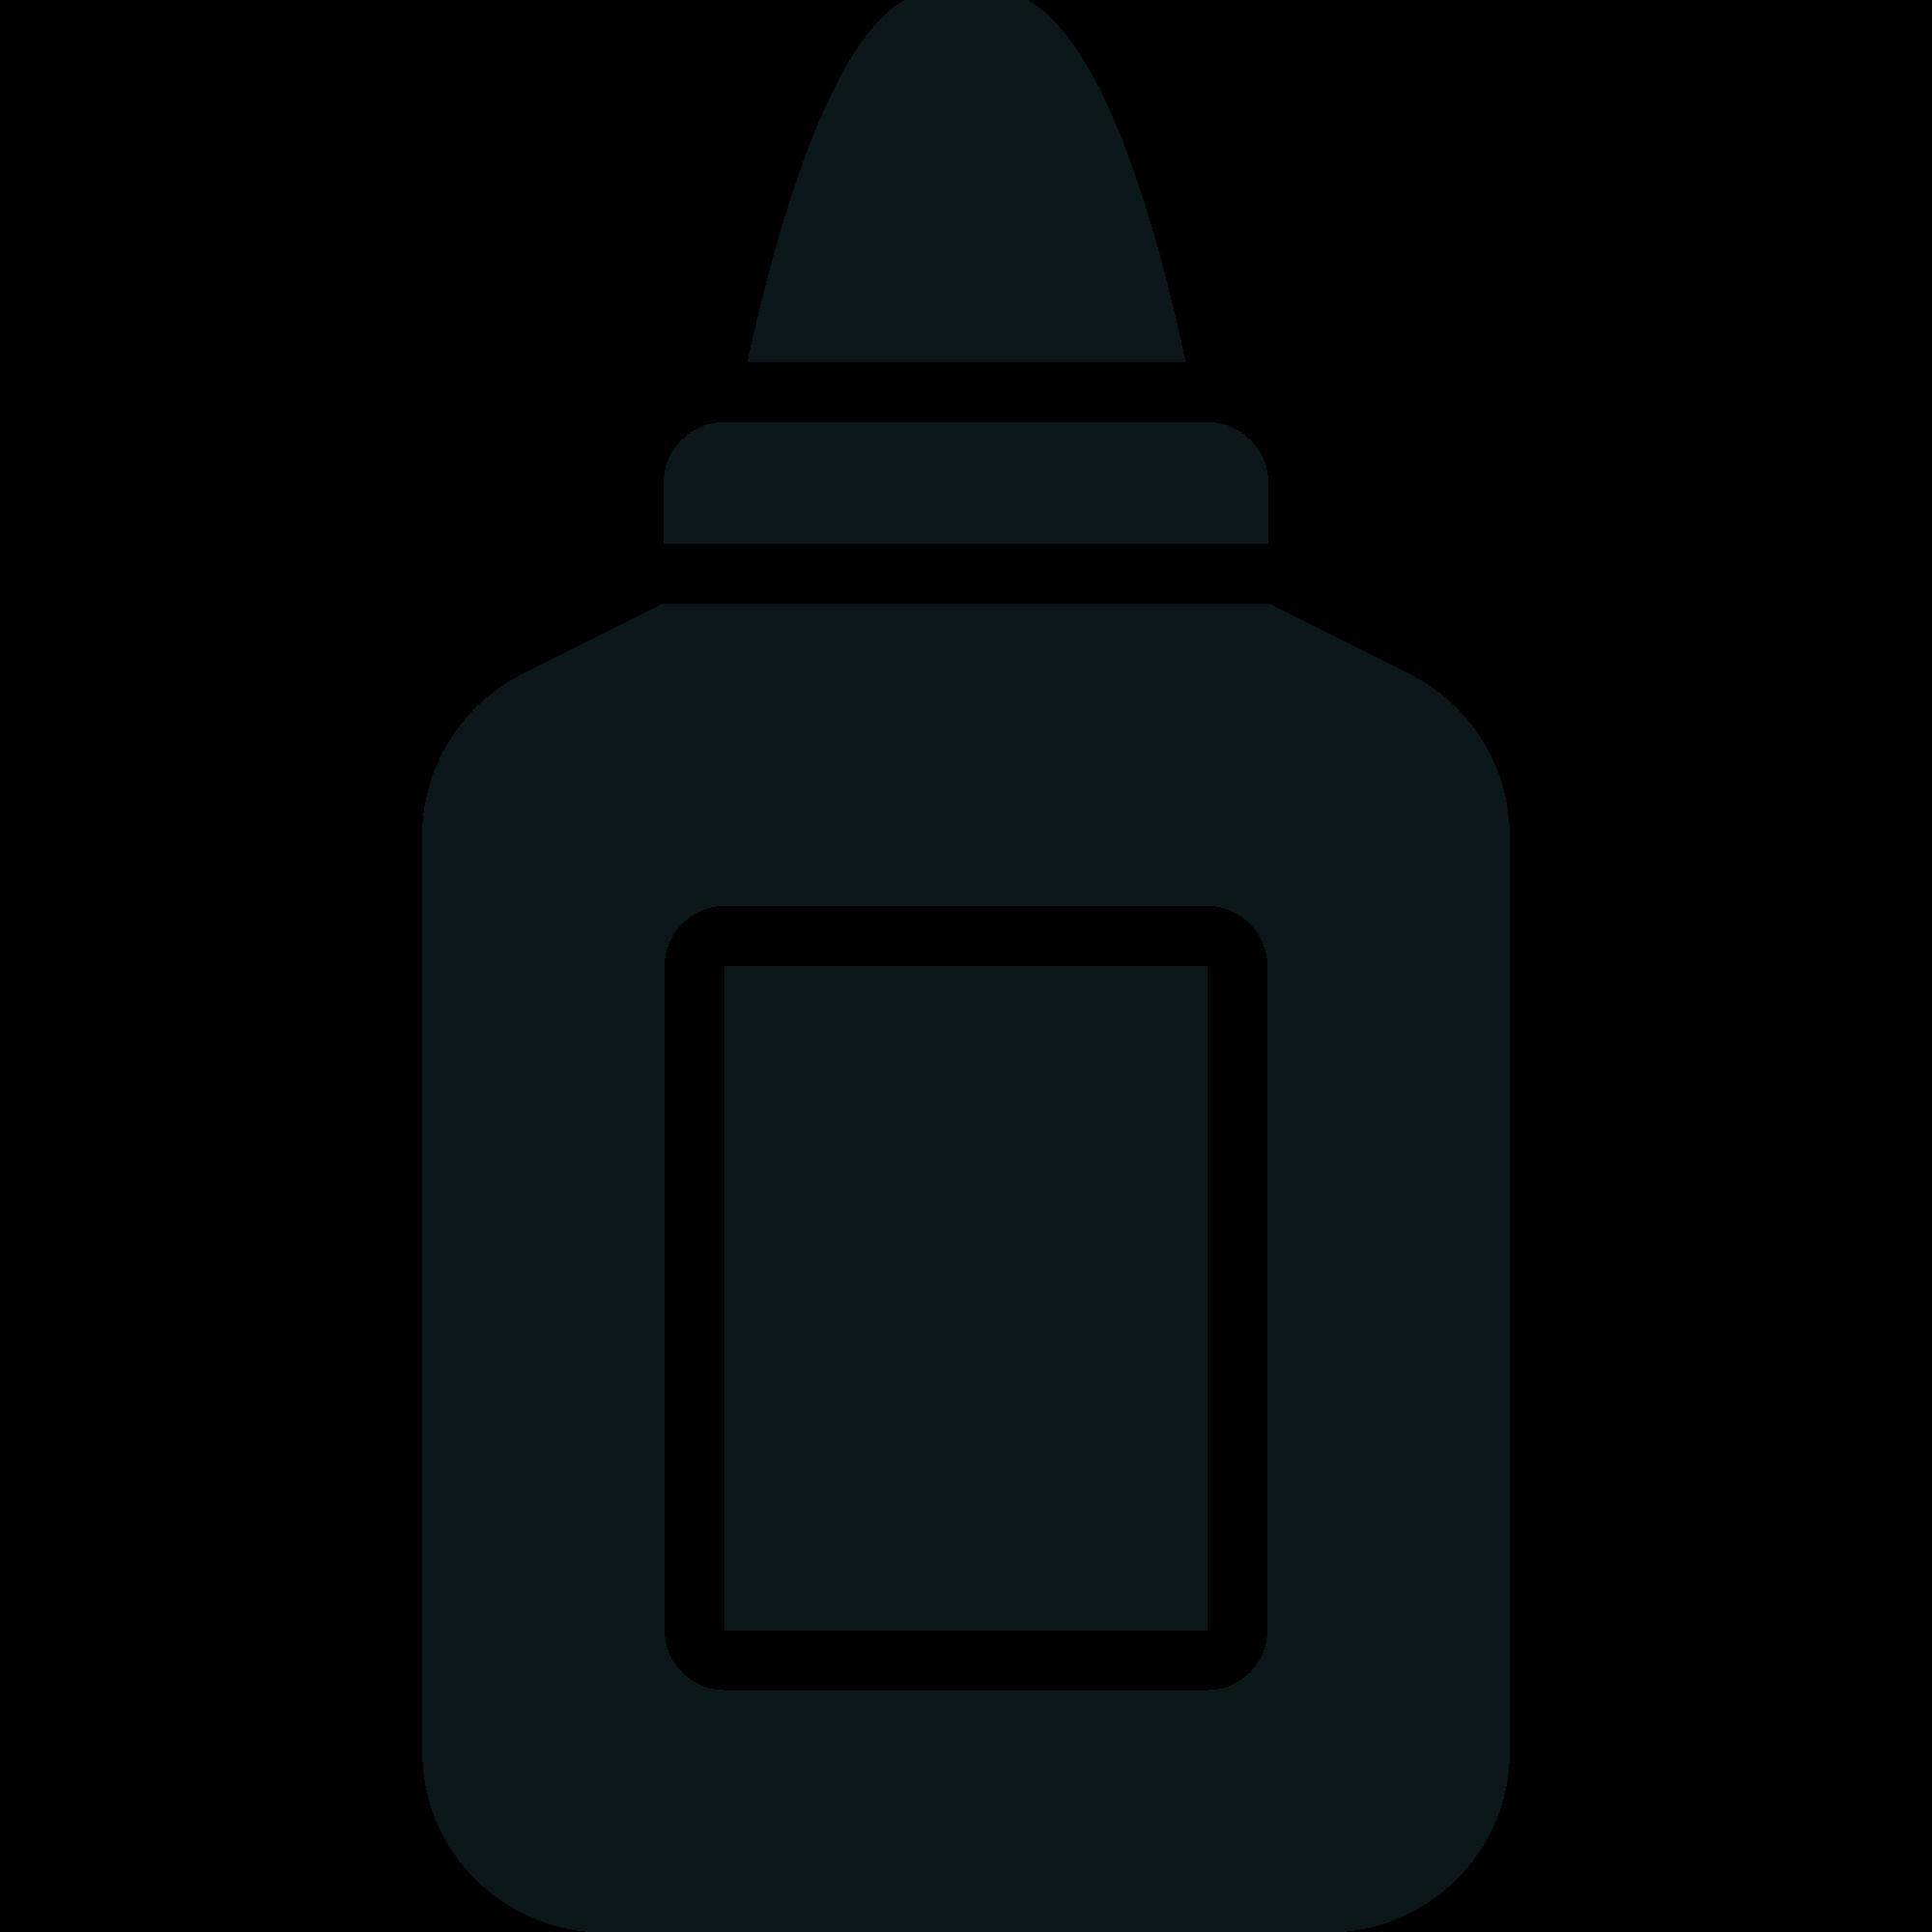 Glue clipart glue bottle. File toicon icon stone